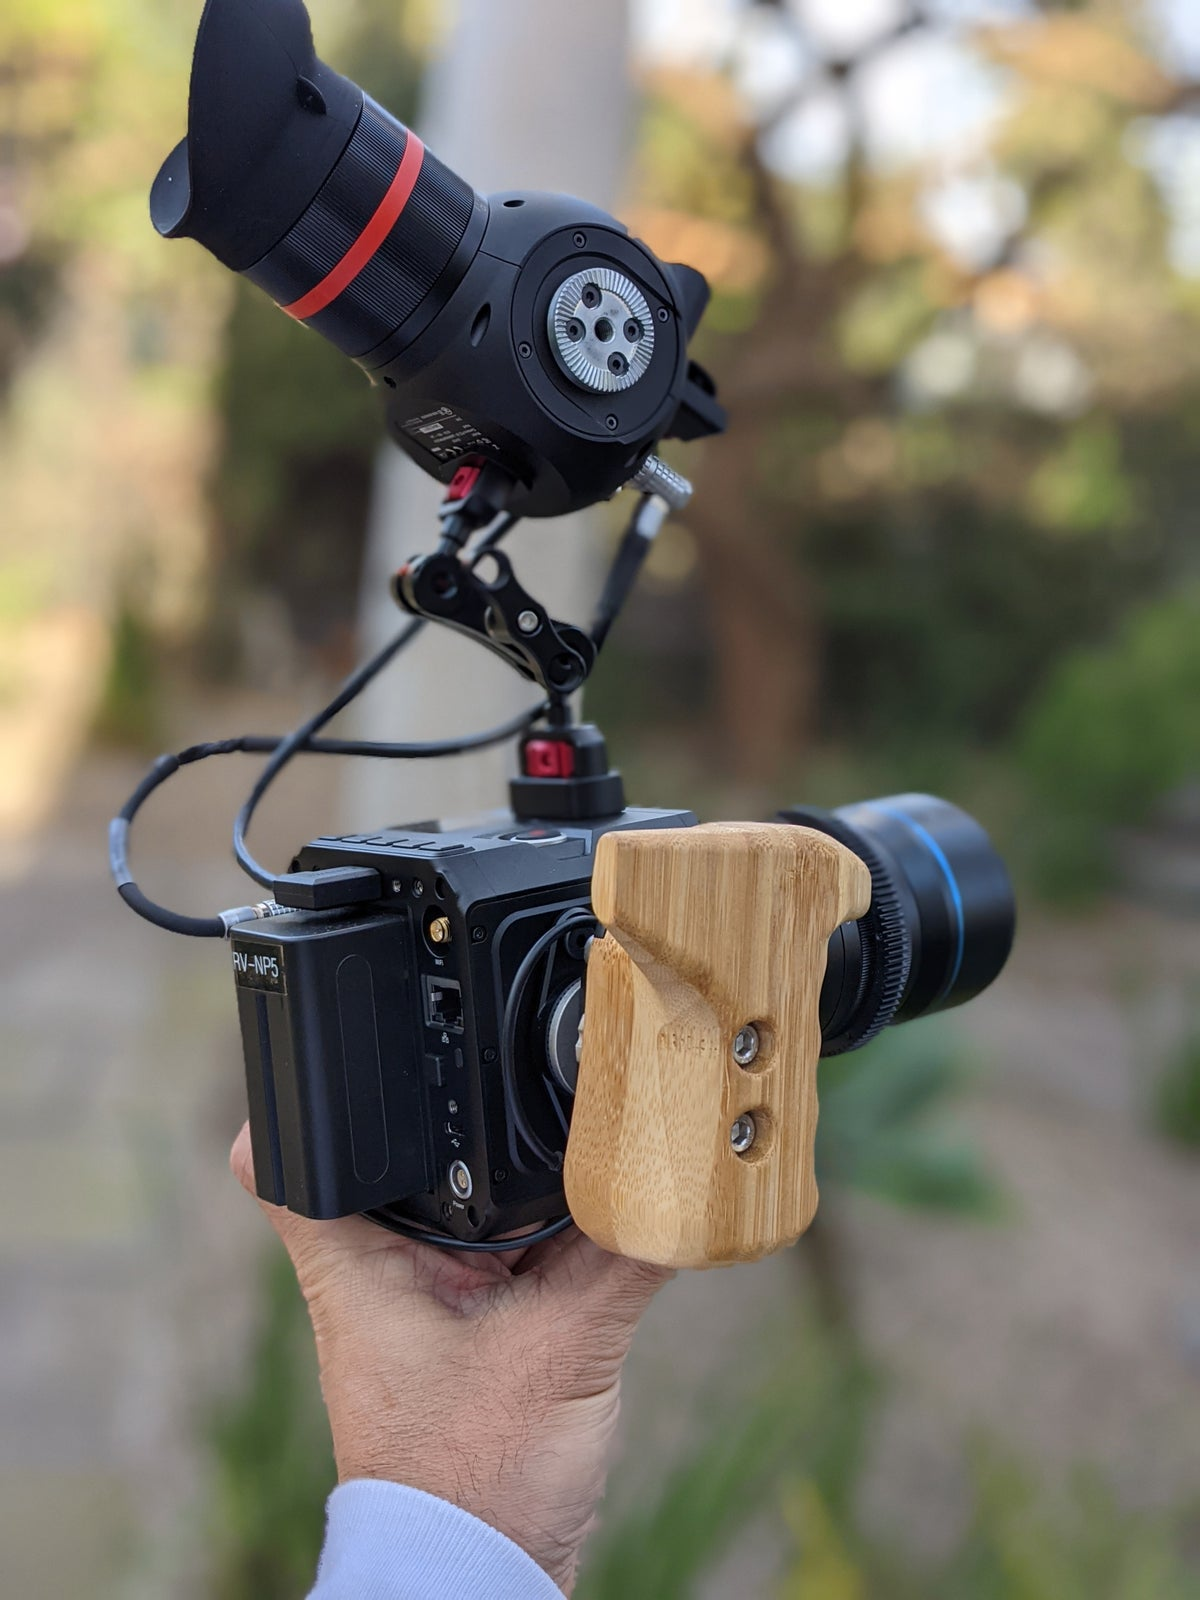 Image of CLUTCH camera remote handle